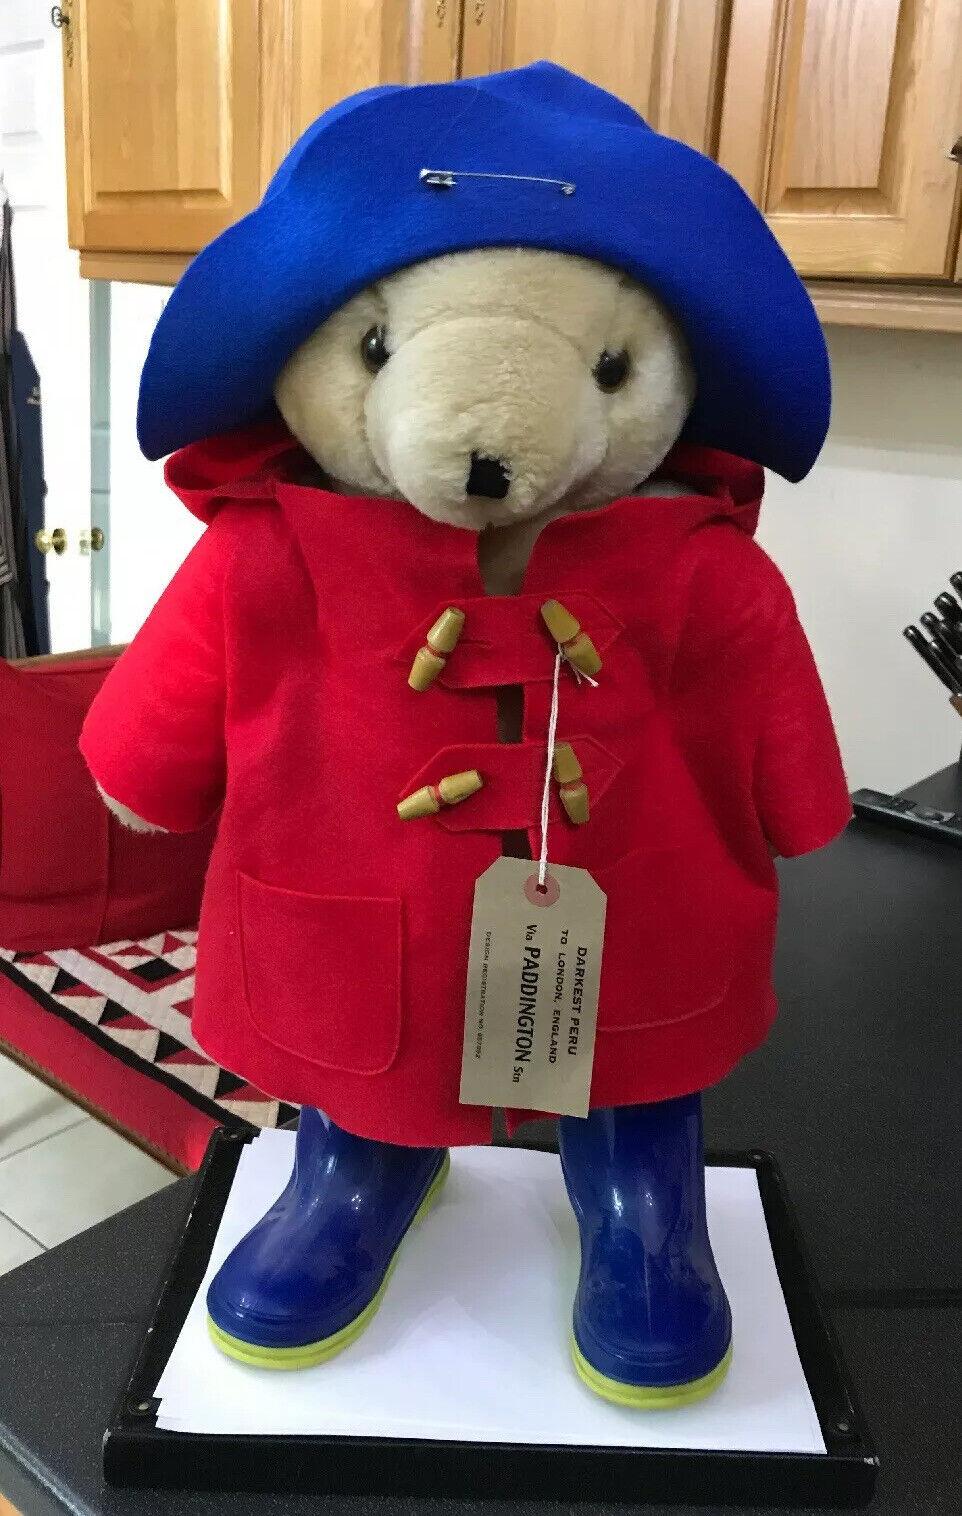 Jahr Large Größe Paddington weich Spielzeug Teddy Bear Teddybear - rot Blau Colourway